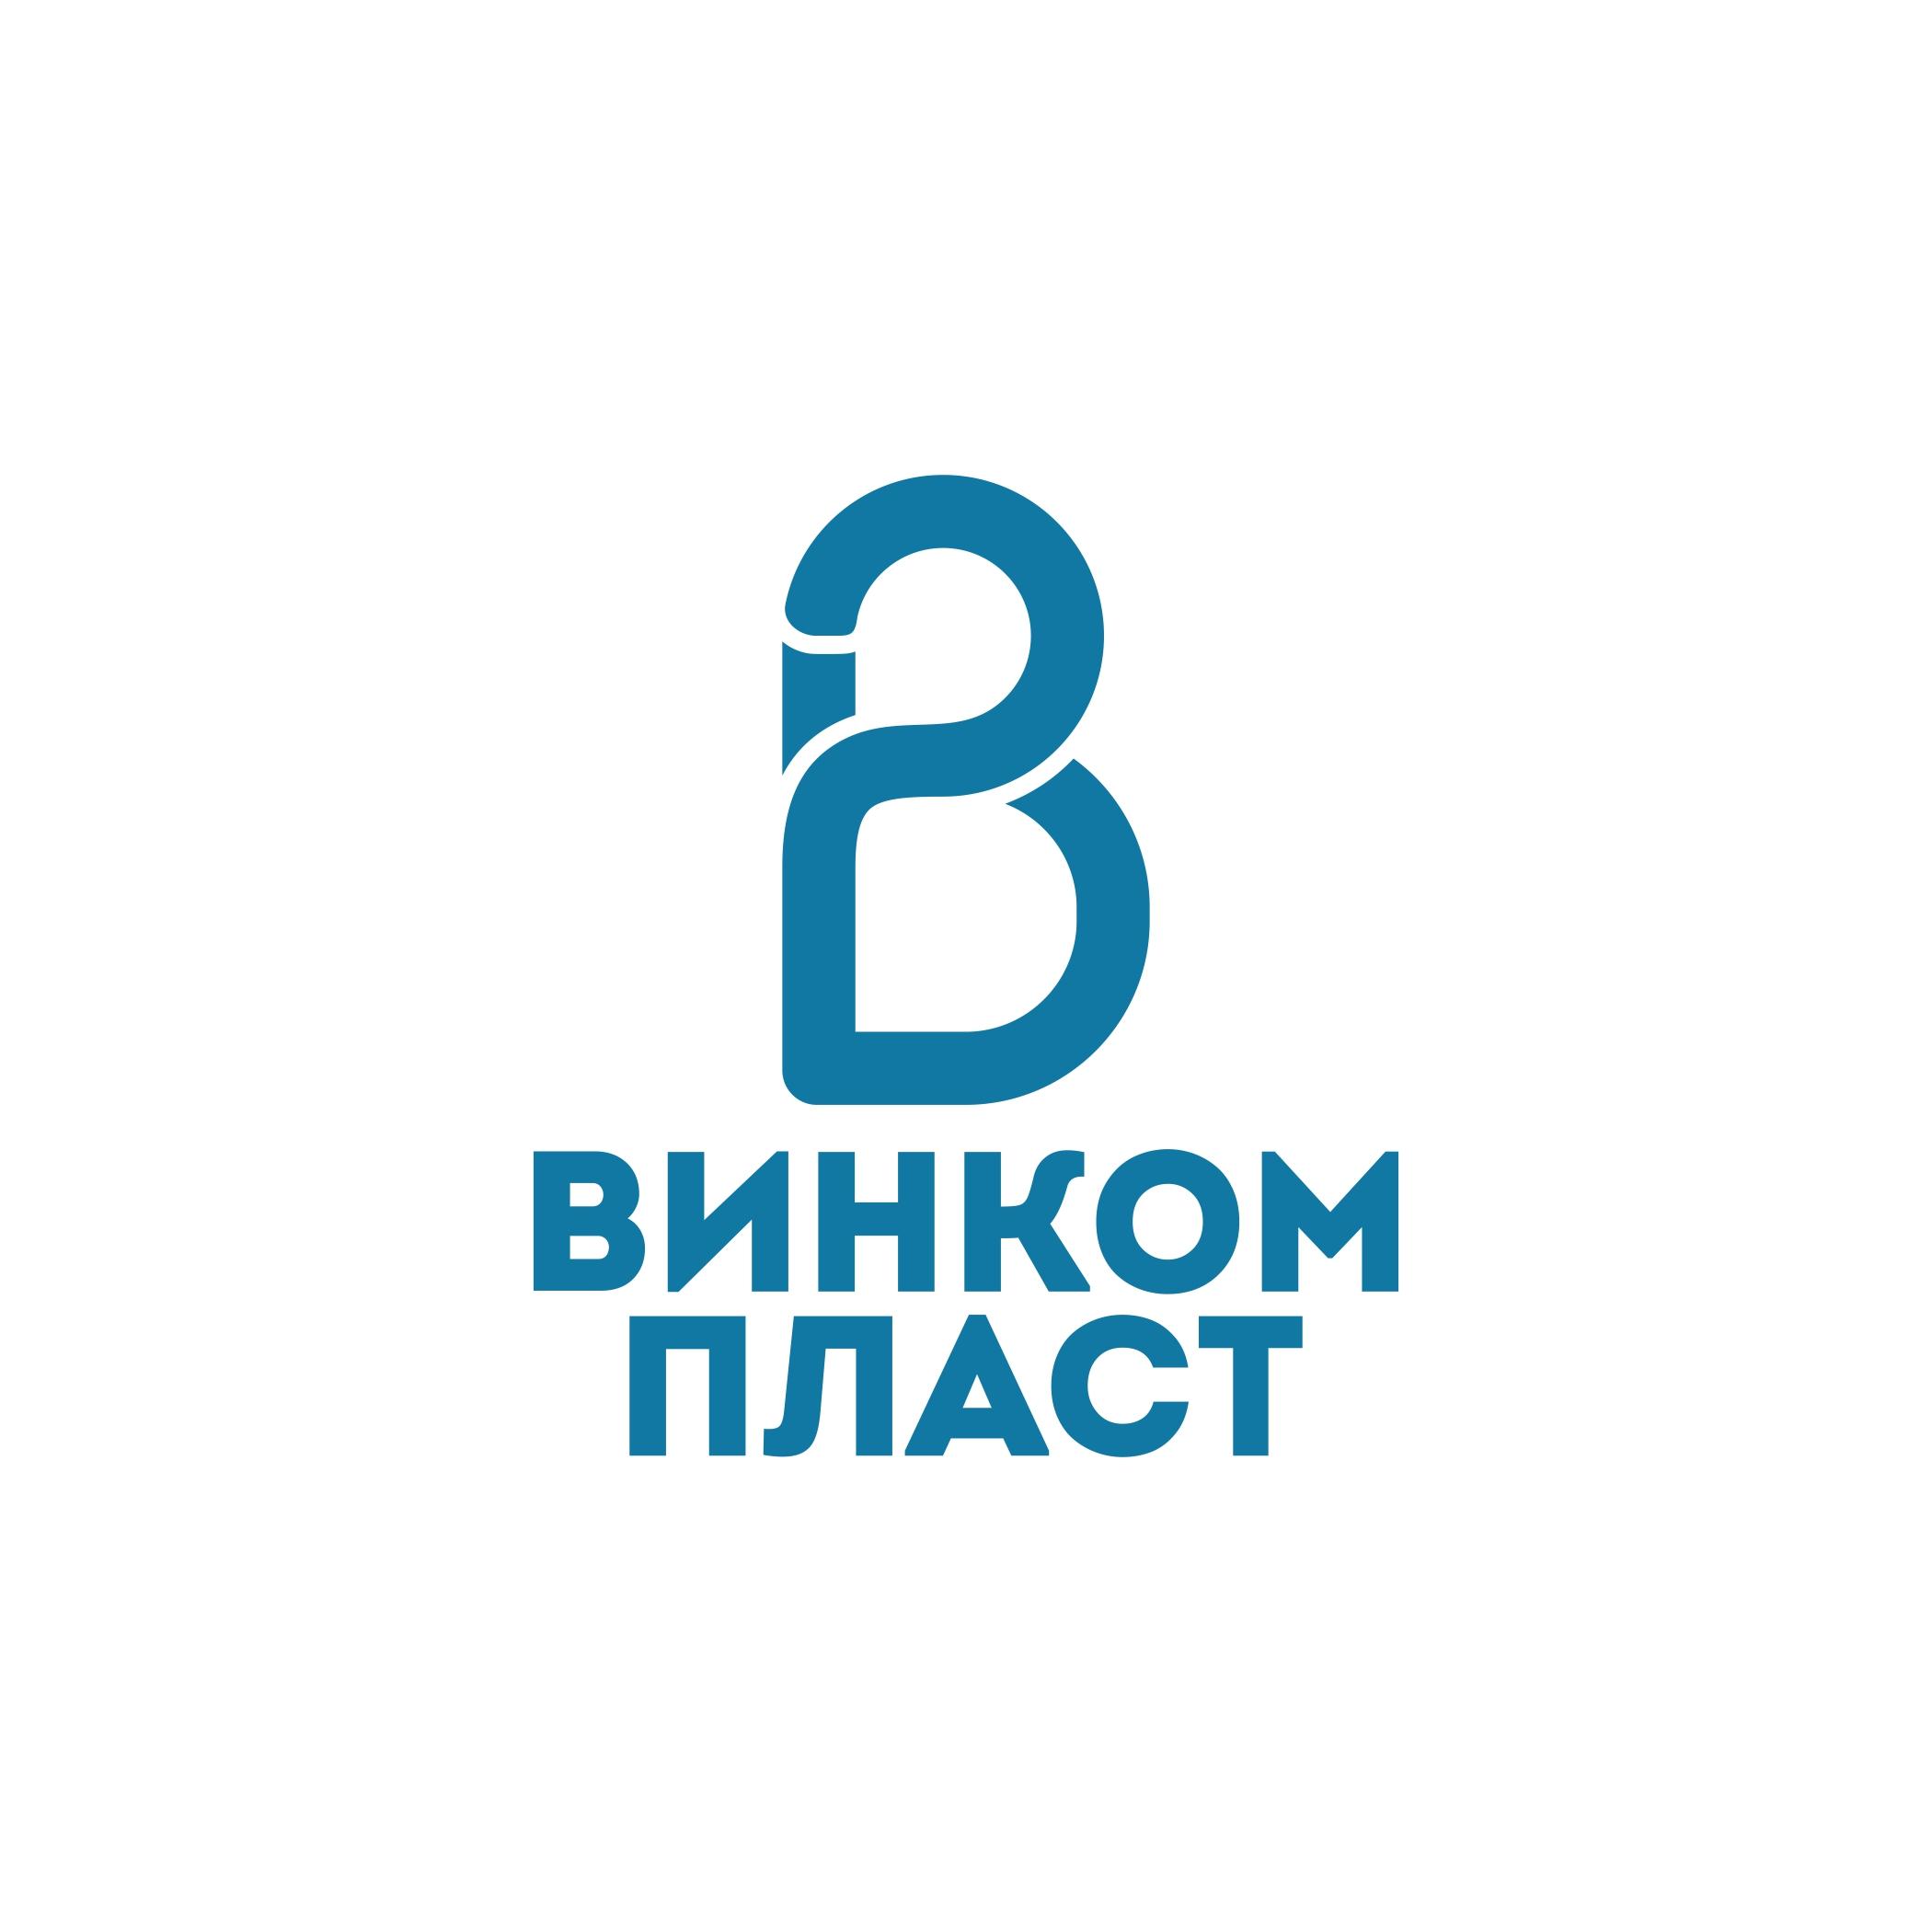 Логотип, фавикон и визитка для компании Винком Пласт  фото f_8725c458e86beb4d.jpg